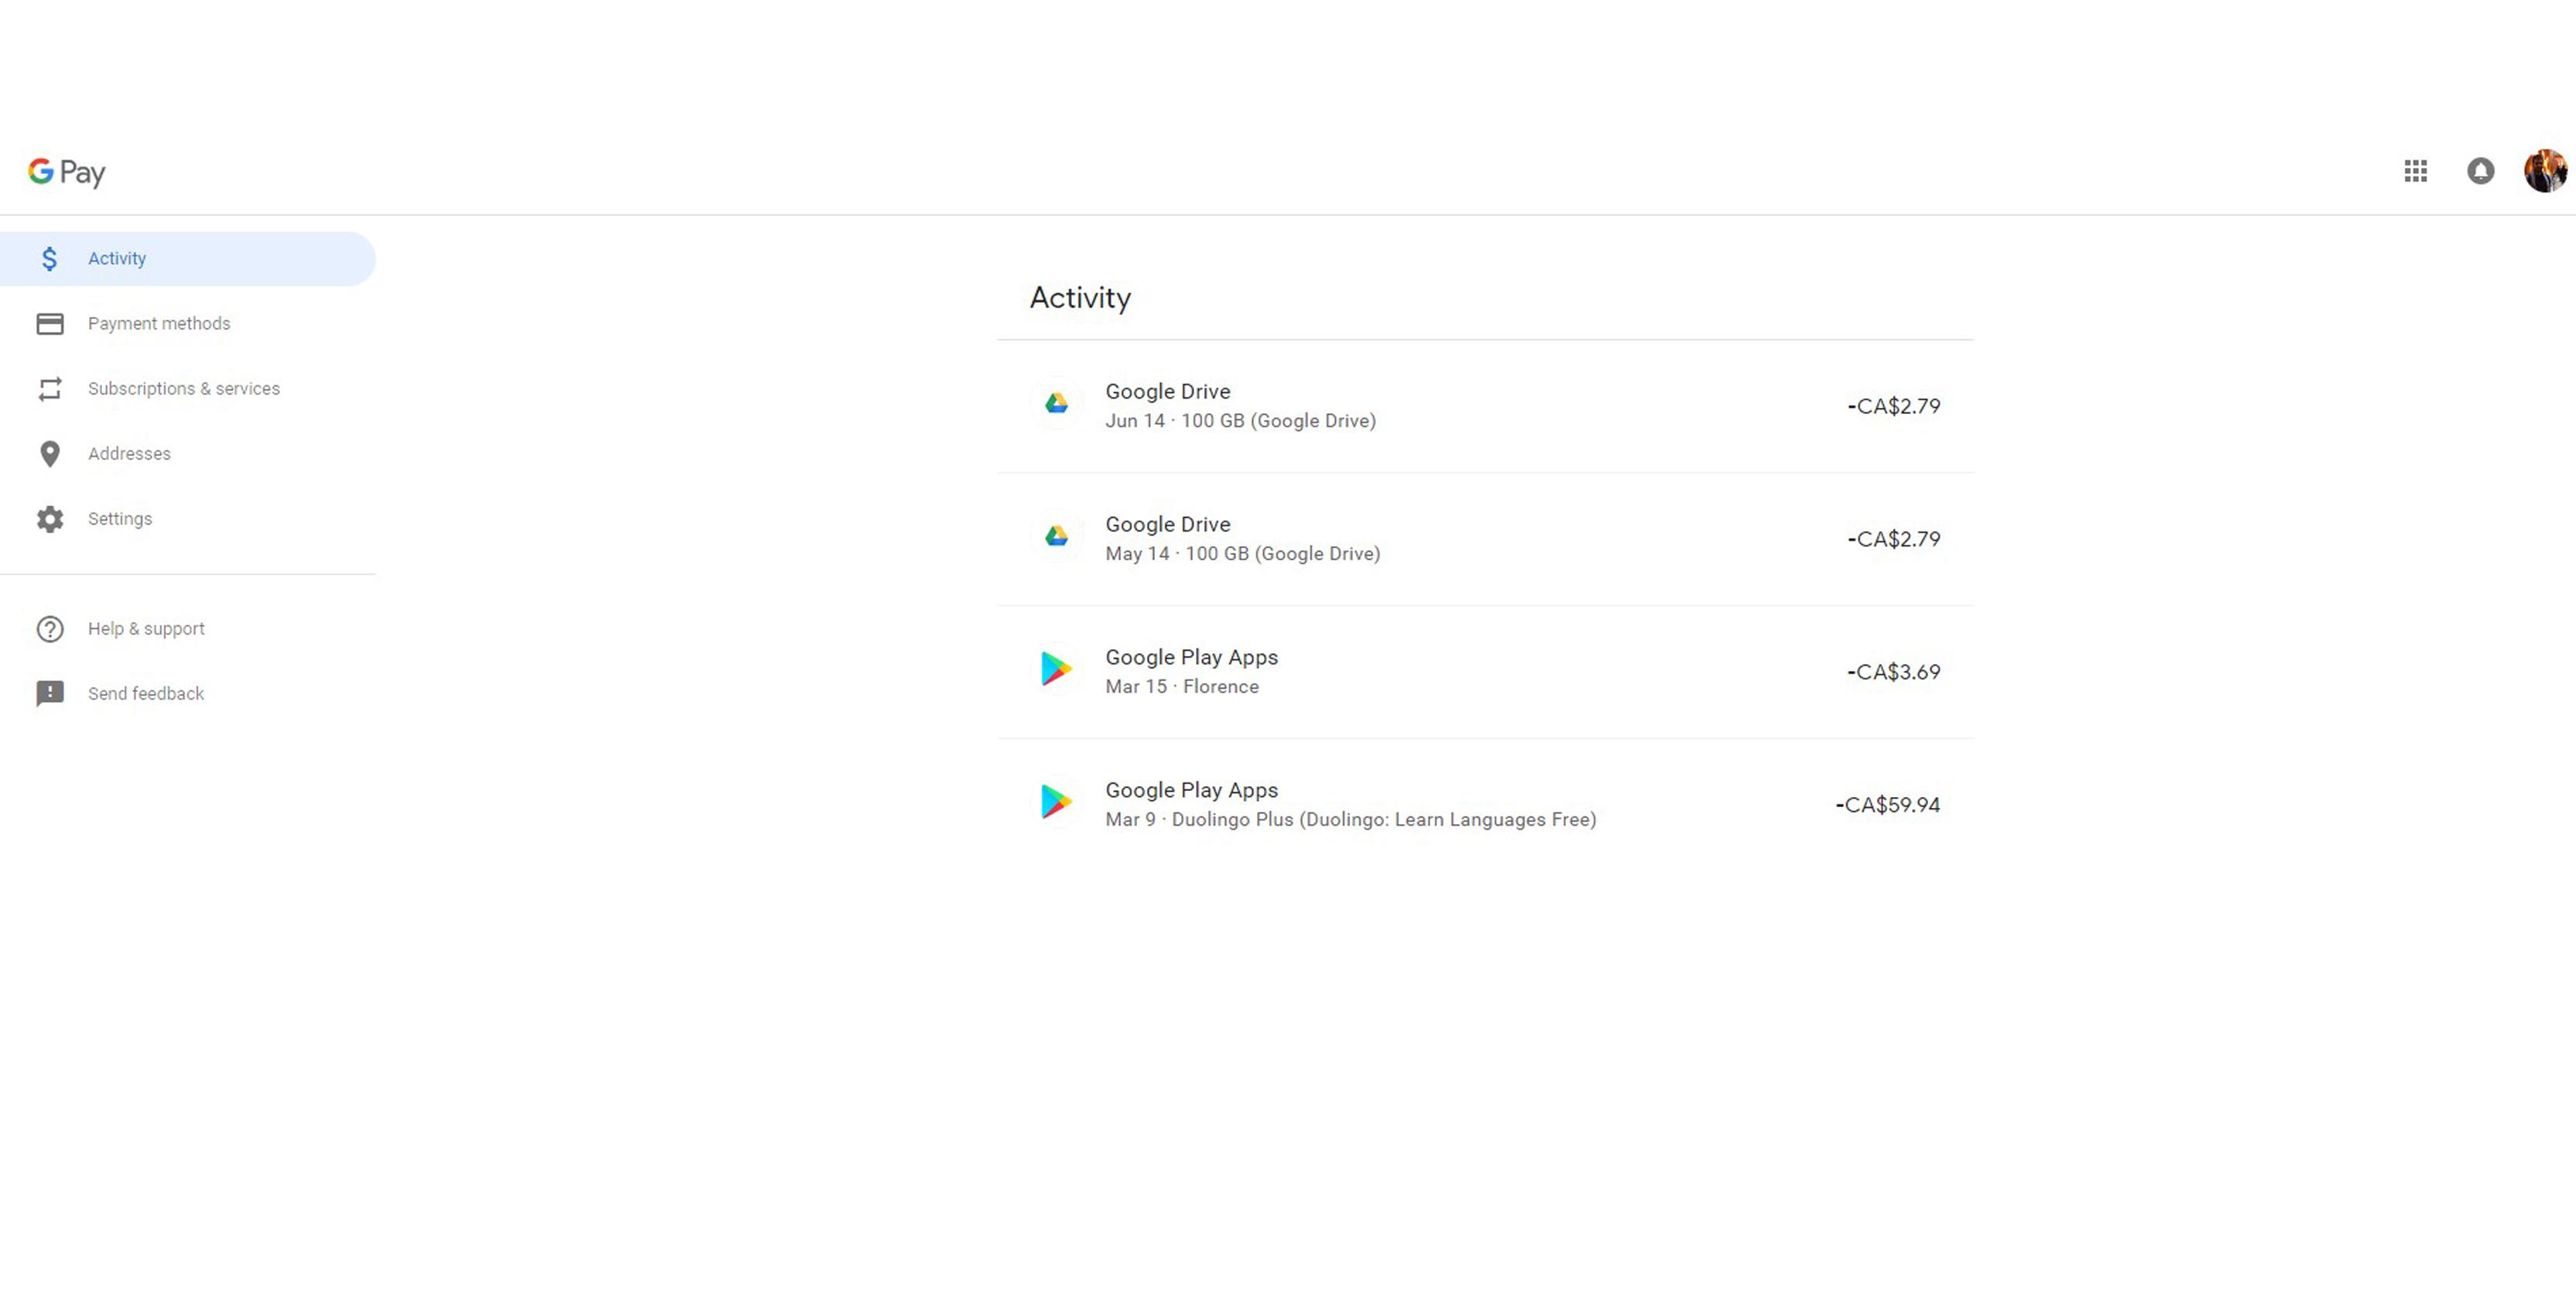 Google Pay's new web client